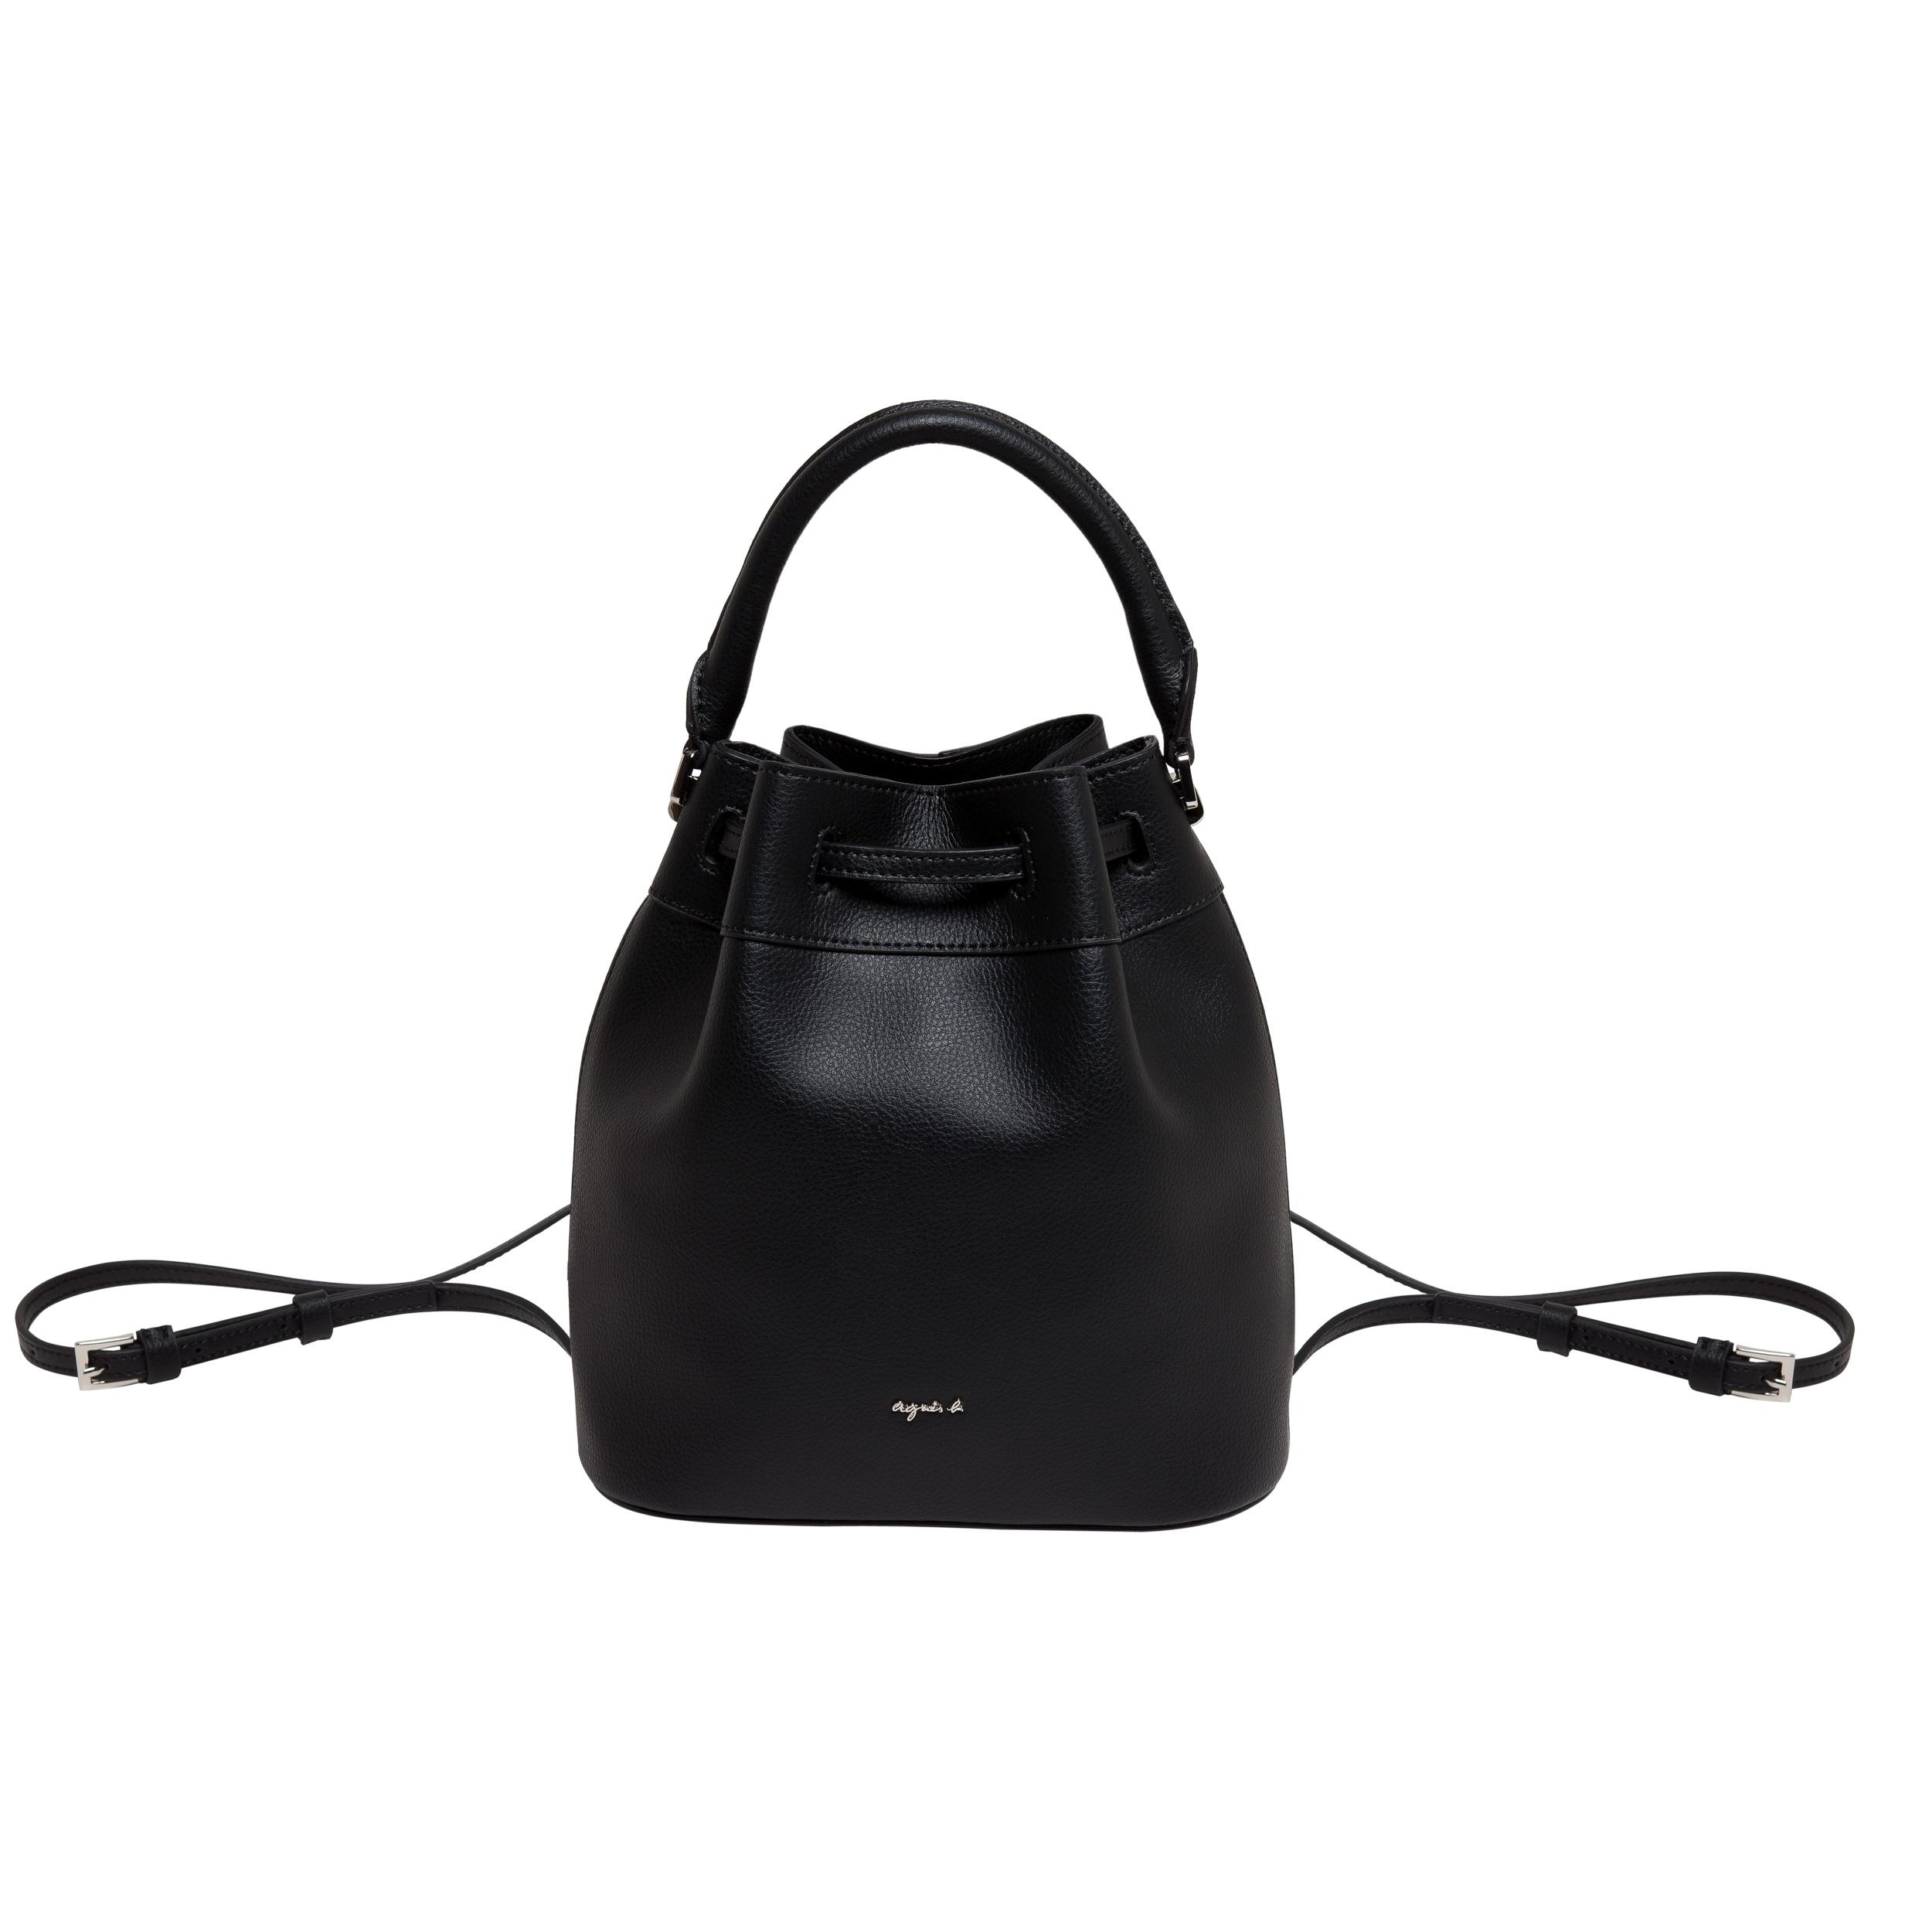 30e88e8a170 agnès b. Alice Black Bucket Bag in Blue - Lyst